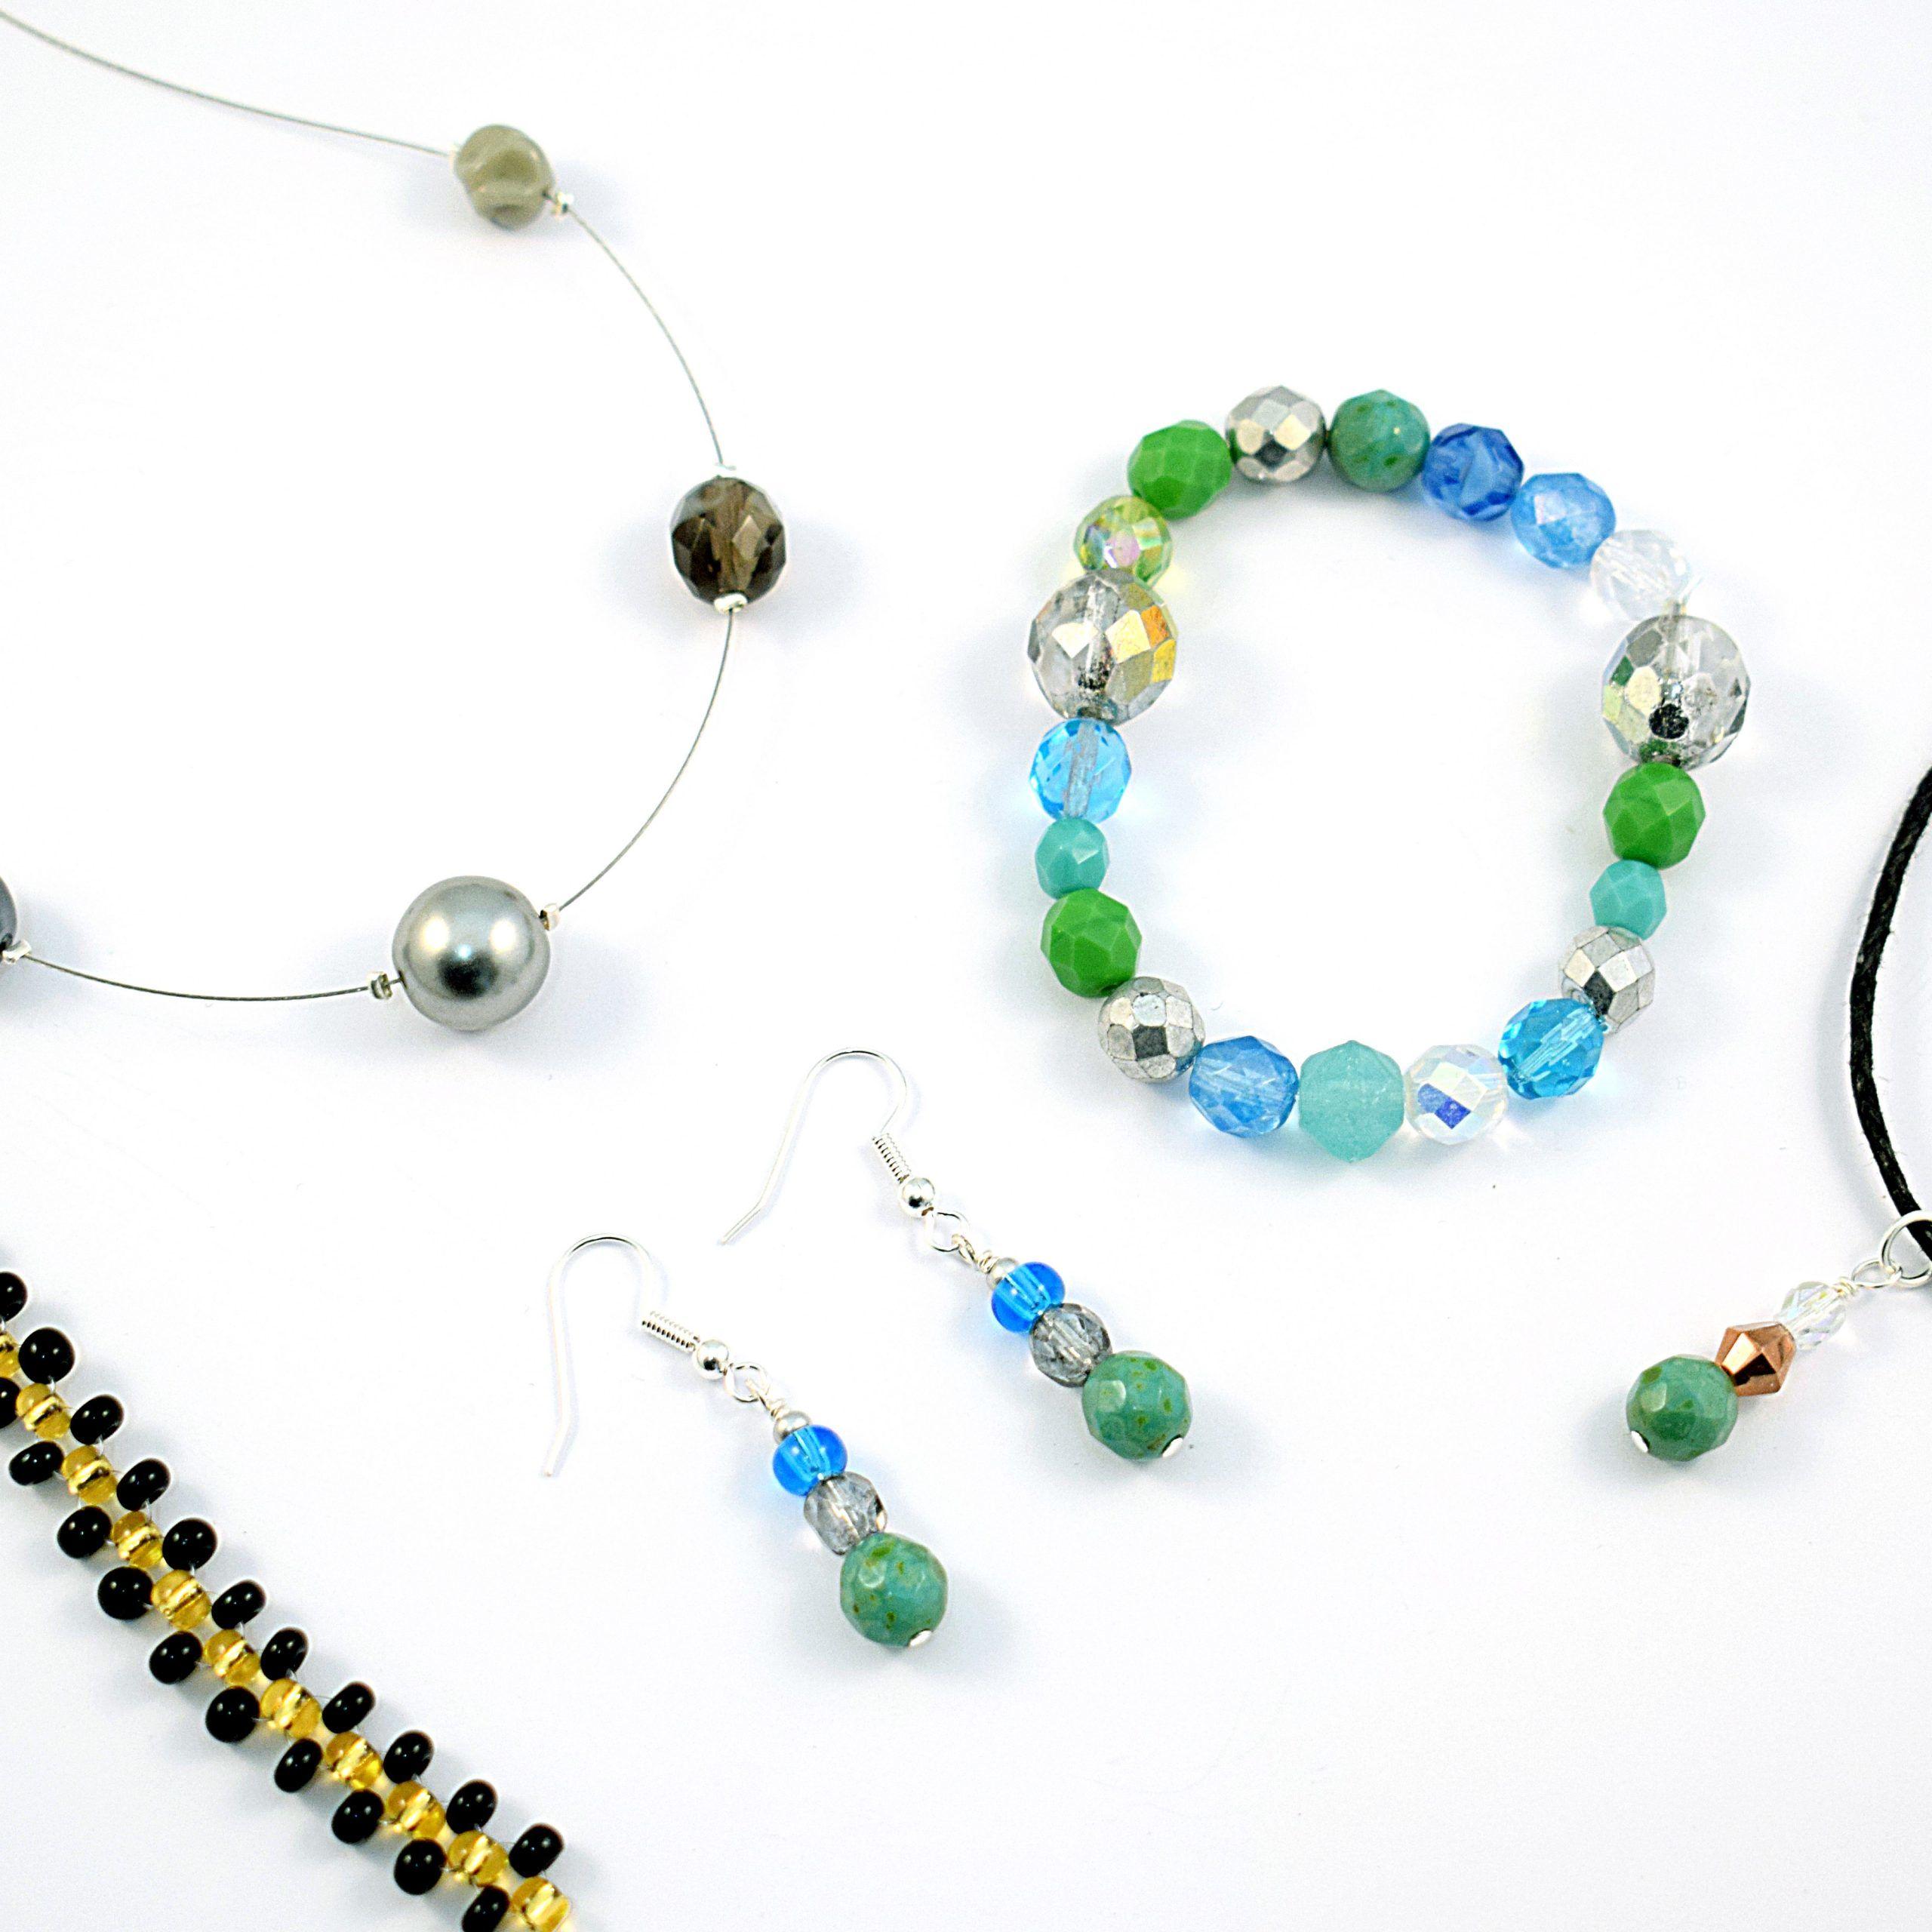 Basic Jewellery Making for Beginners